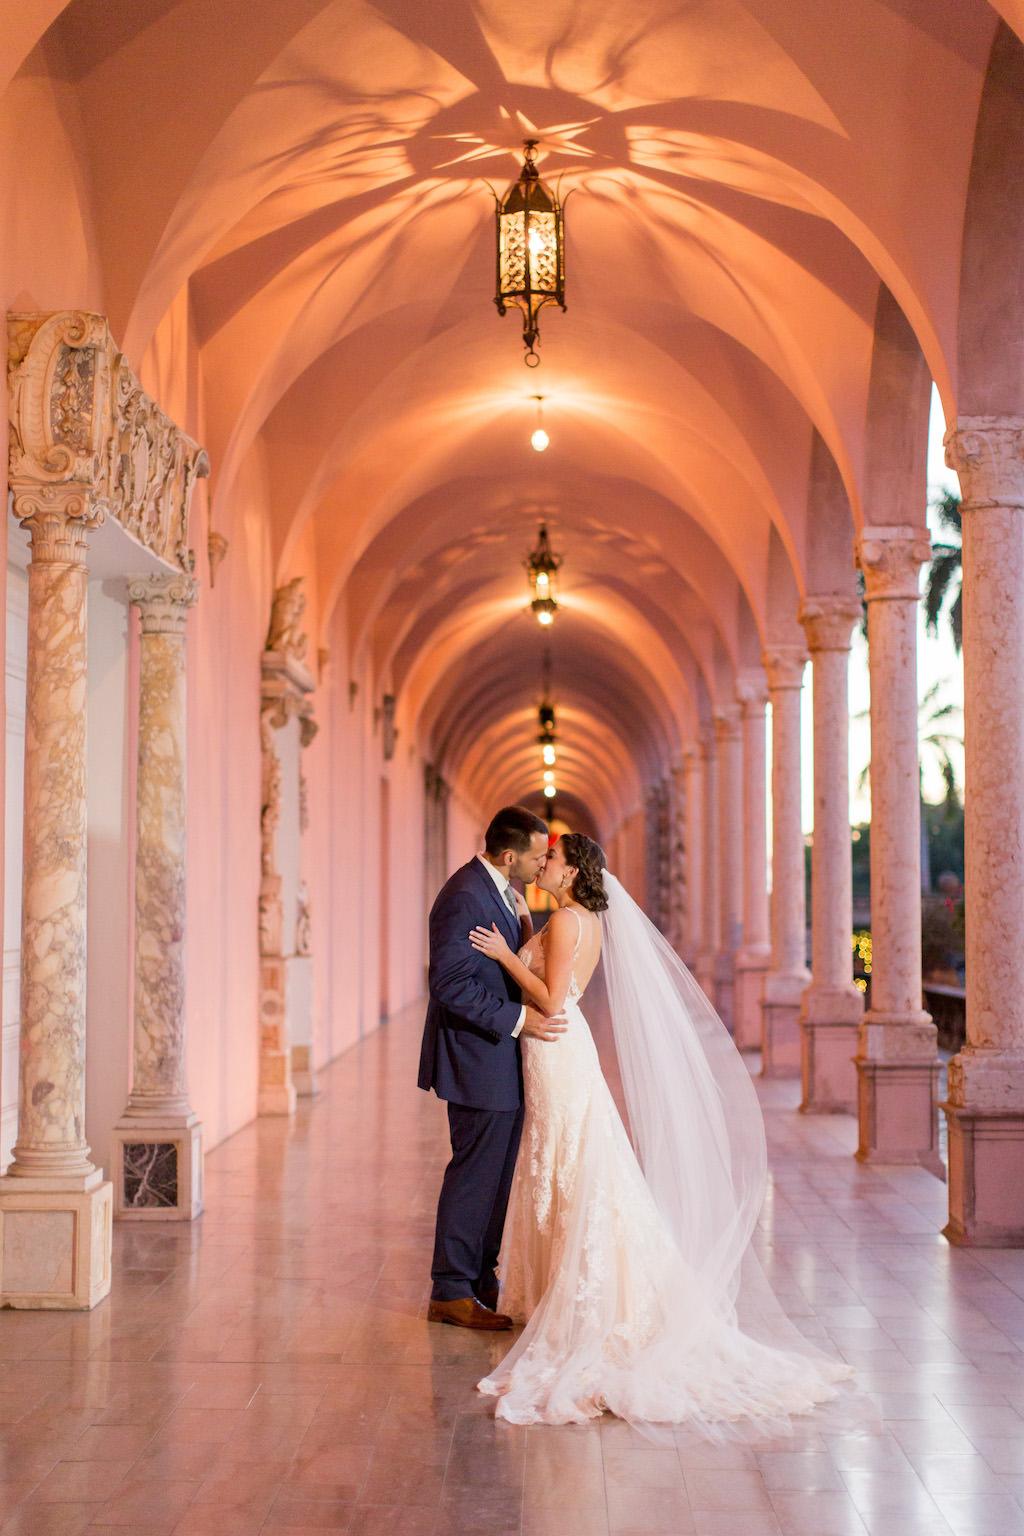 Florida Bride and Groom Wedding Portrait | Sarasota Wedding Venue Ringling Museum